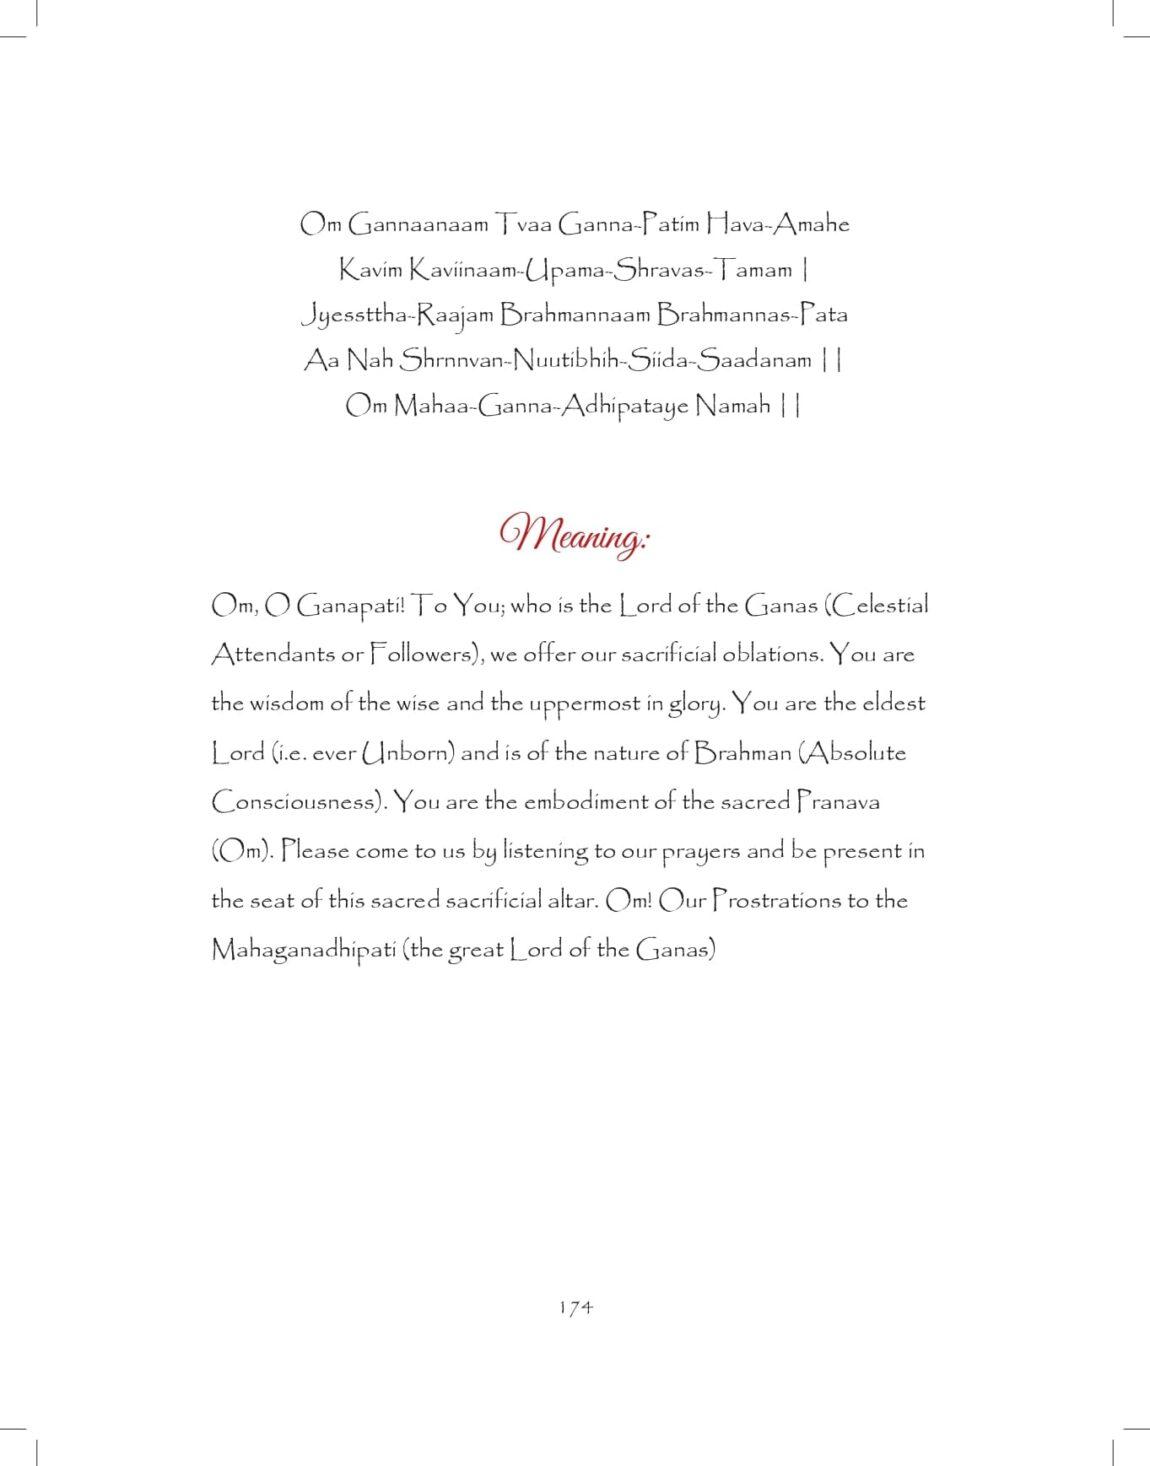 Ganesh-print_pages-to-jpg-0174.jpg